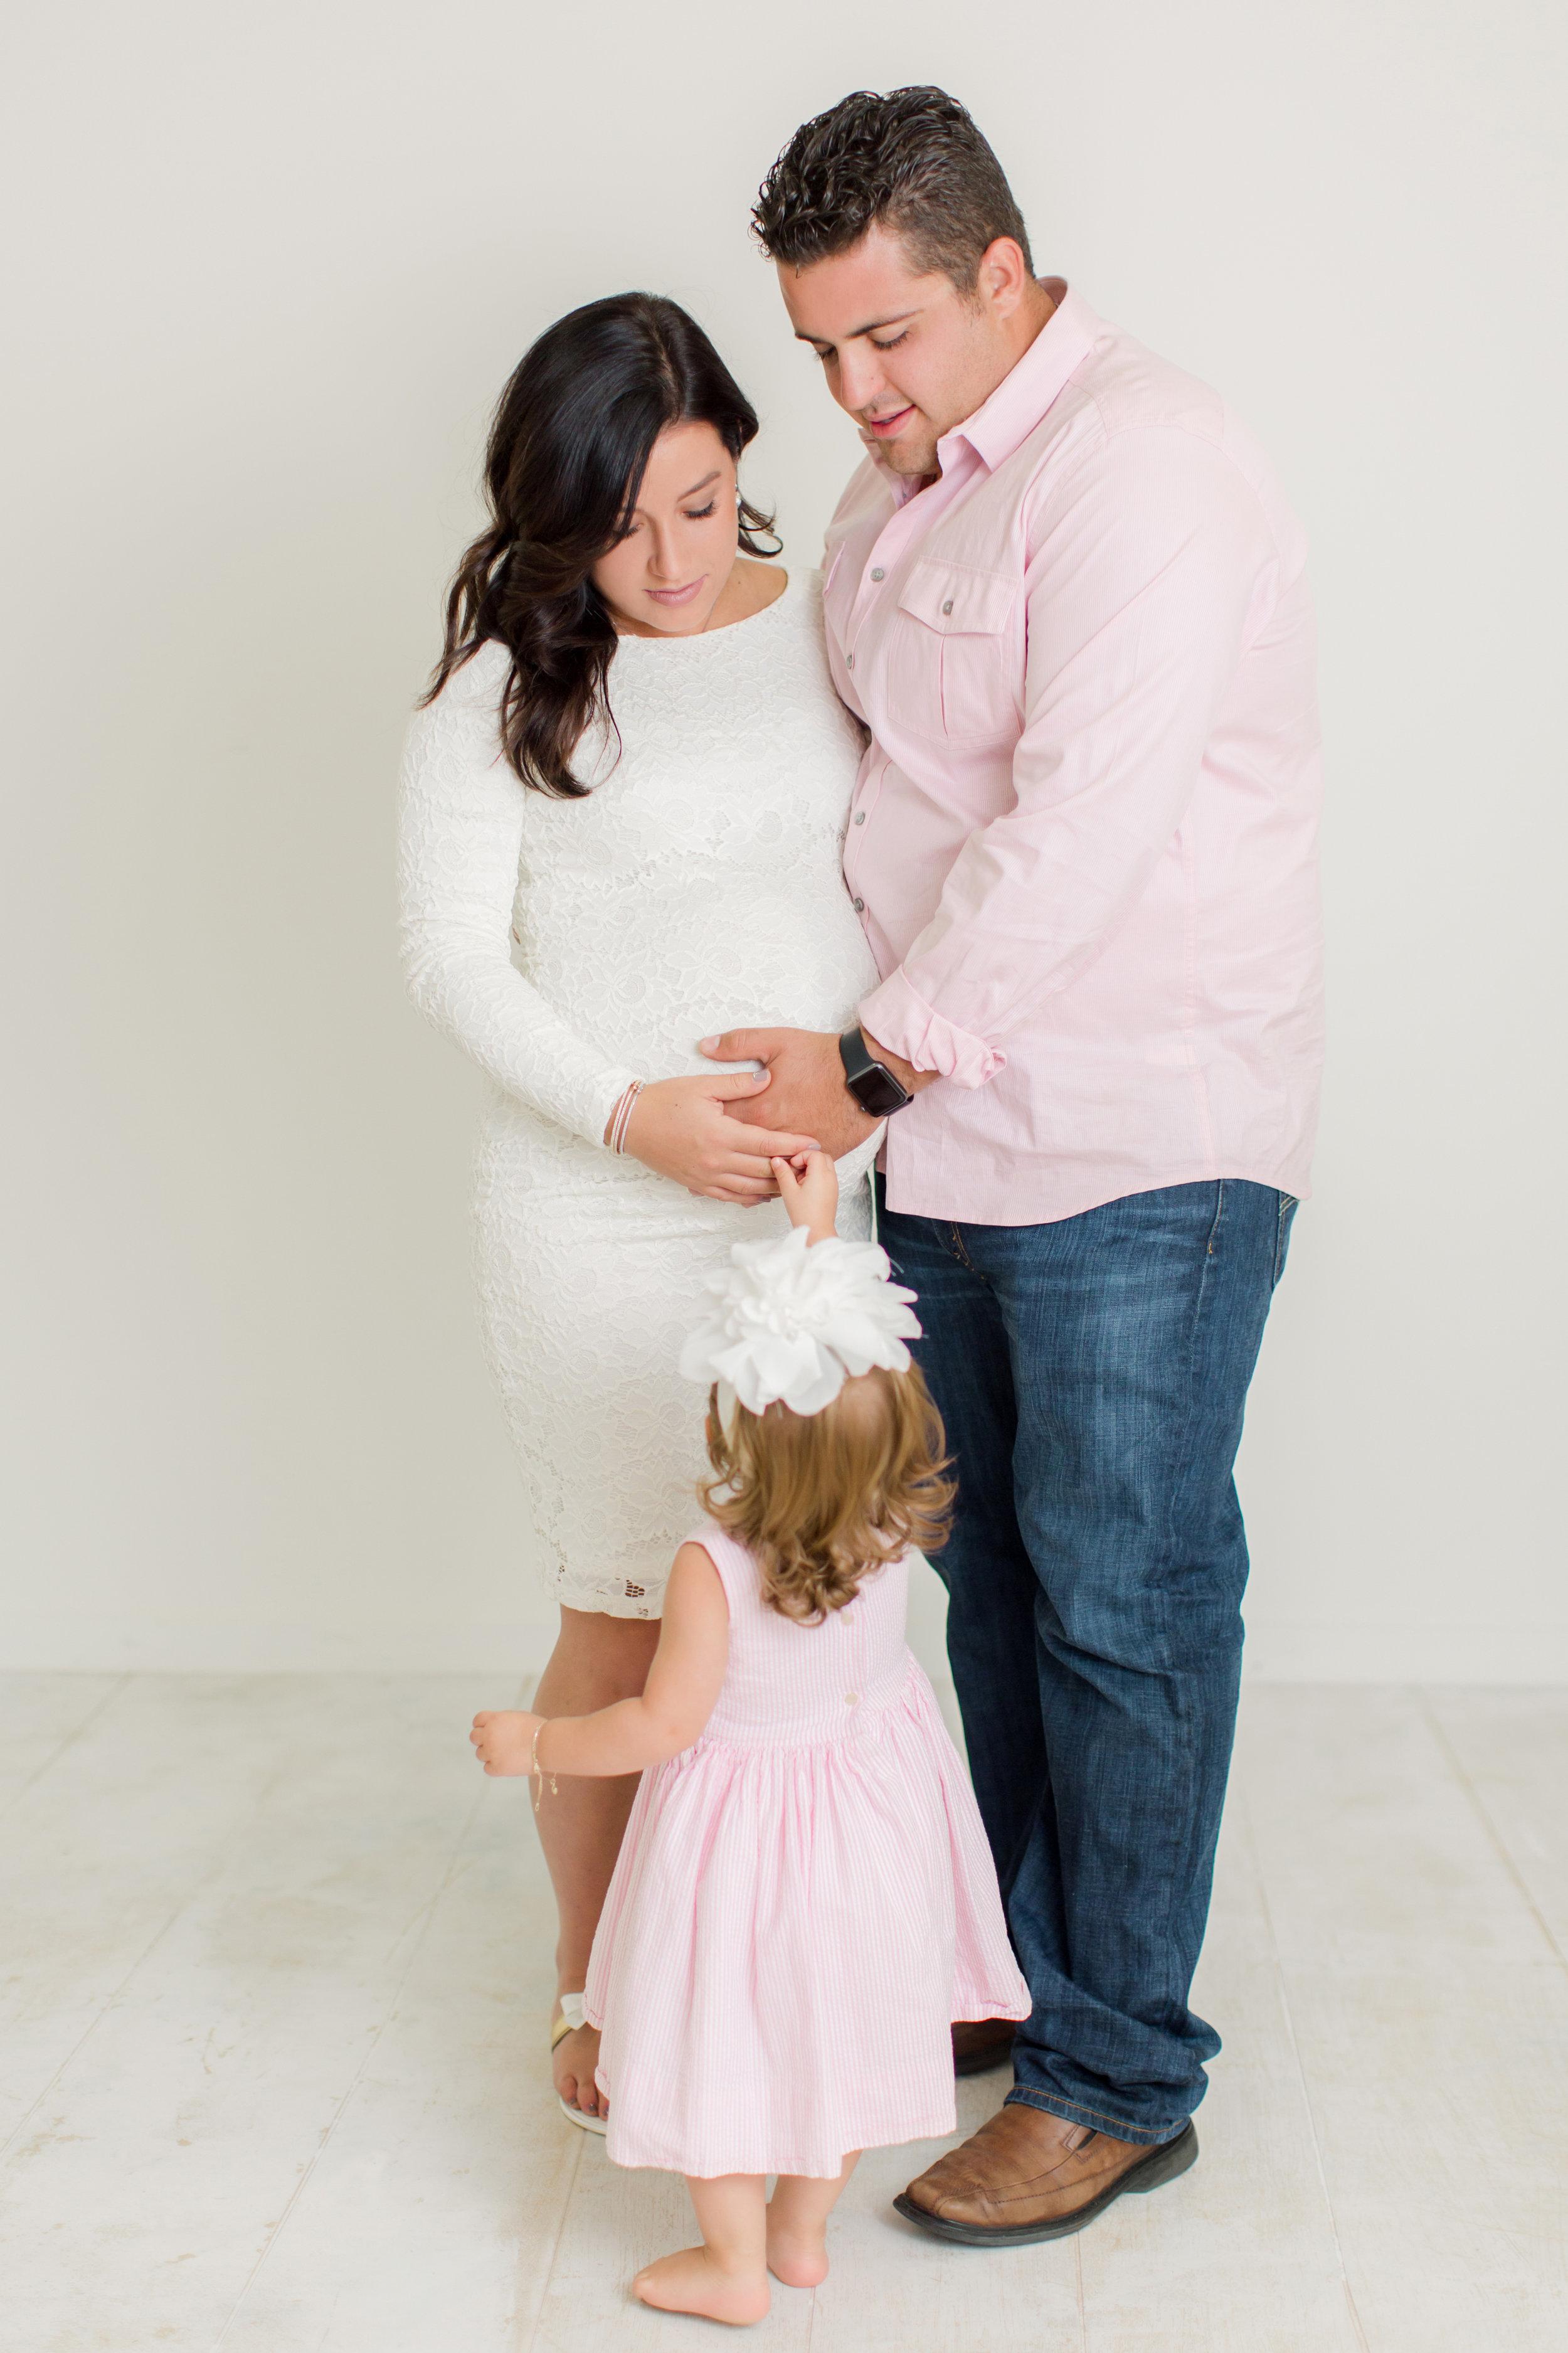 Munaco_Maternity2-10.jpg